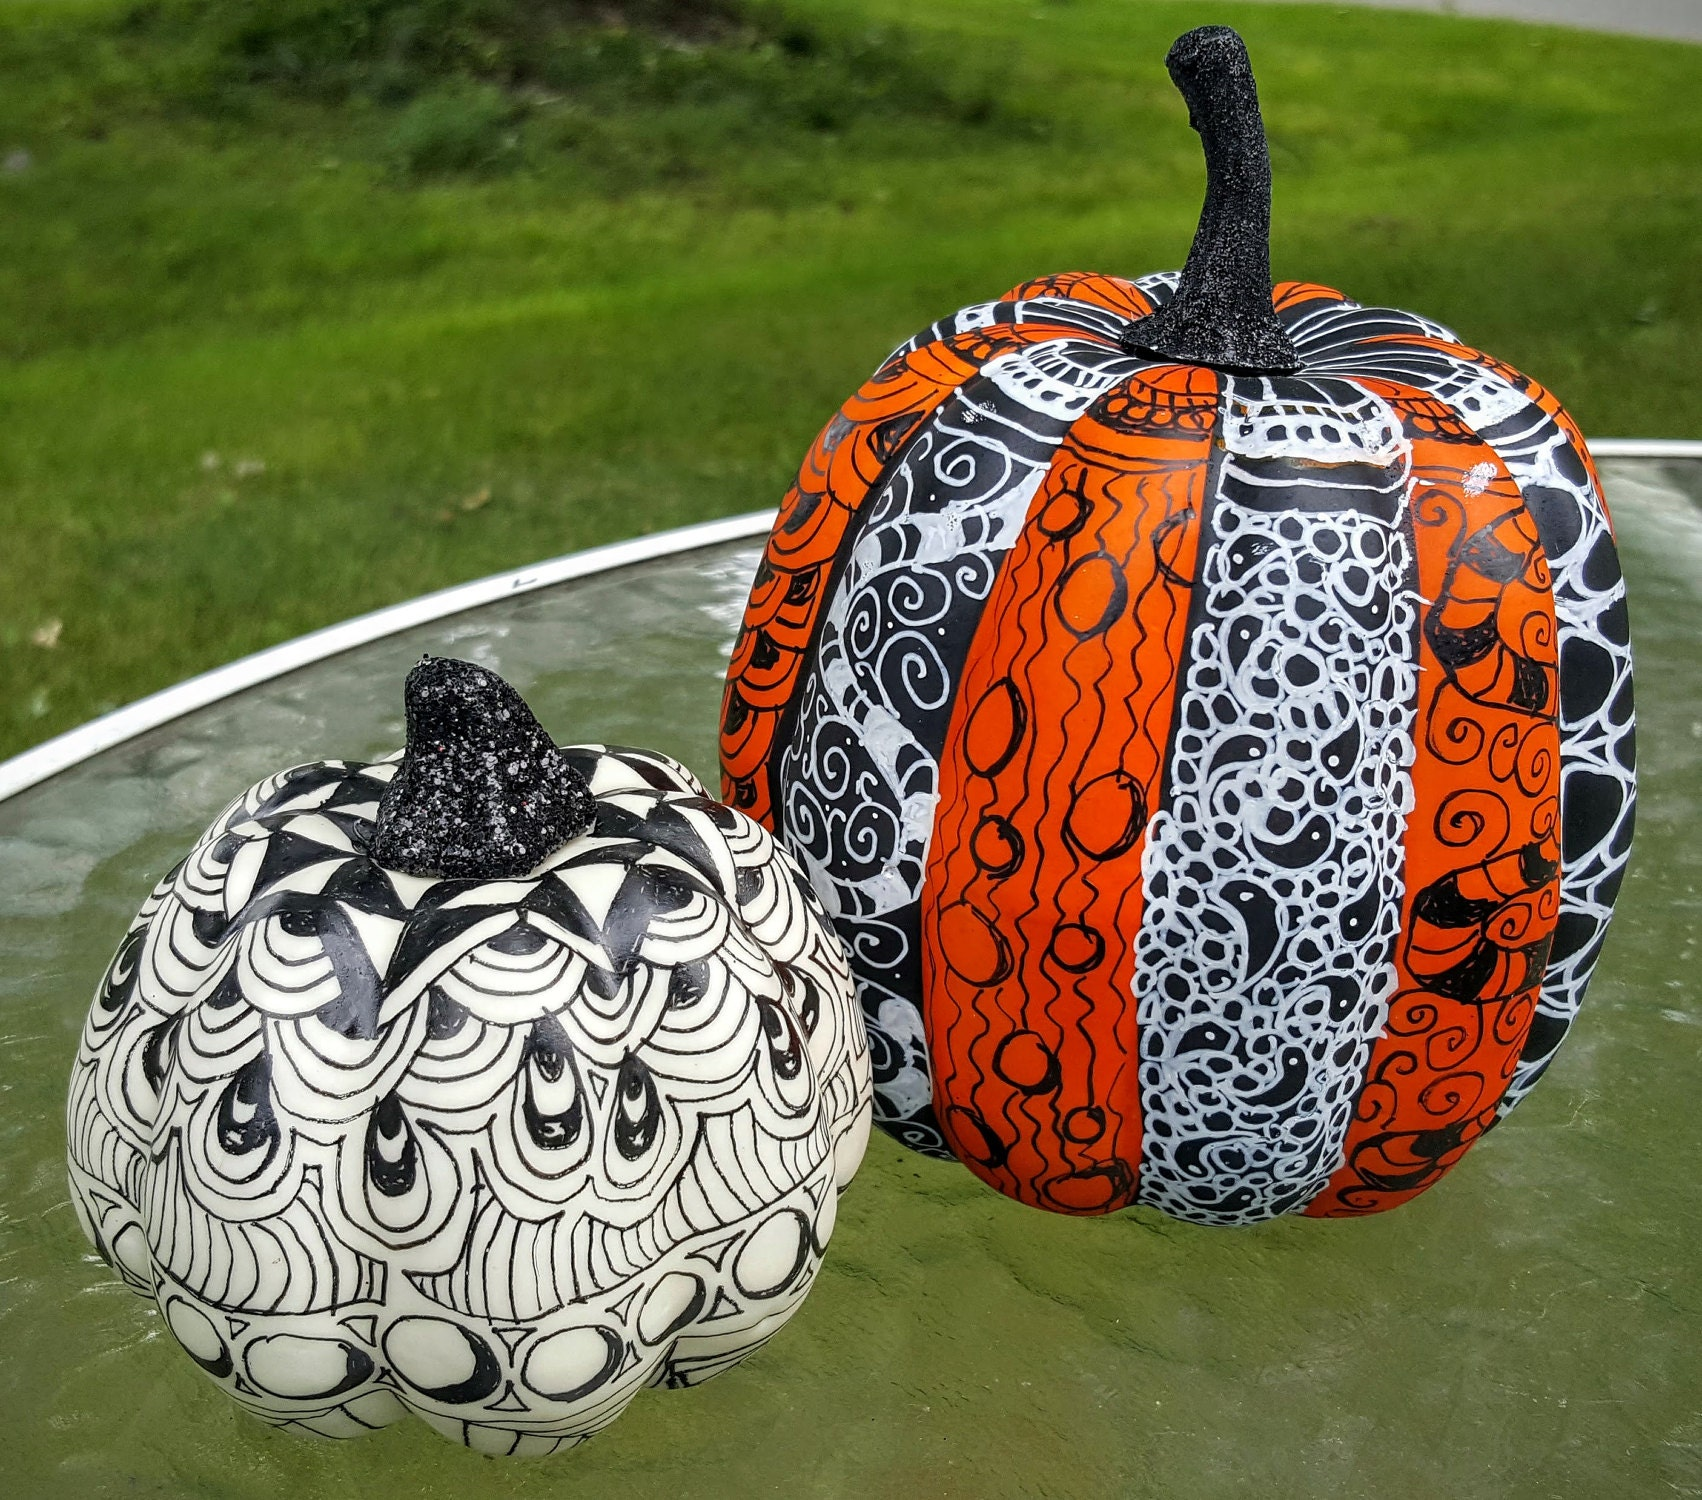 Halloween Harvest Pumpkin decorations - graphic tangled designes